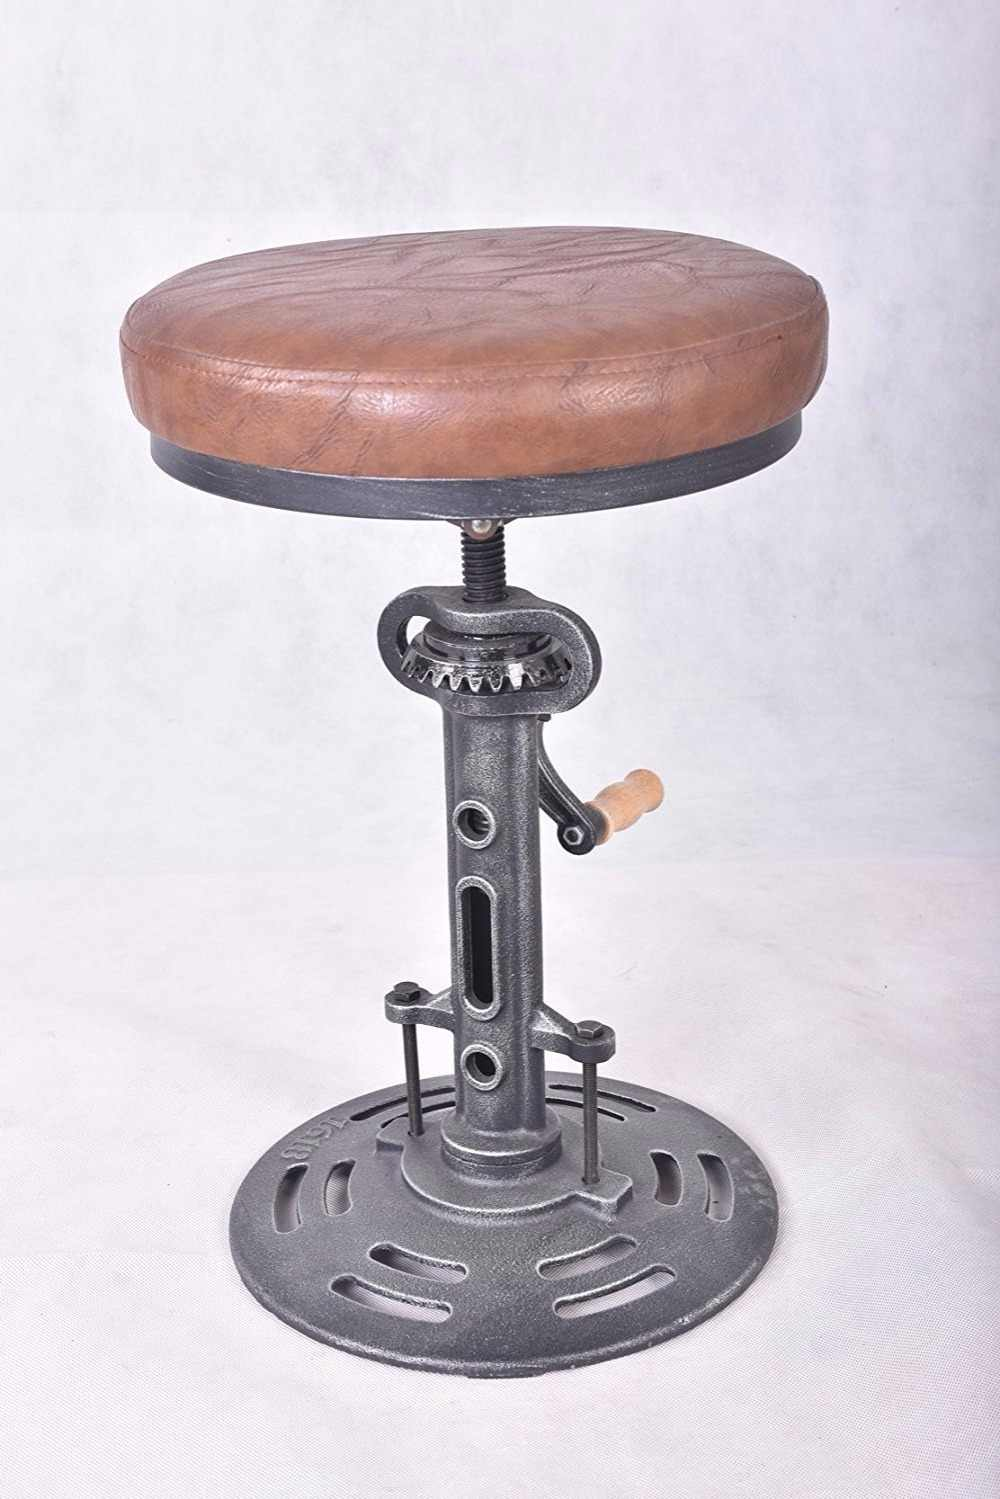 Marvelous American Antique Industrial Bar Stool Diy Crank Handle Cafe Frankydiablos Diy Chair Ideas Frankydiabloscom